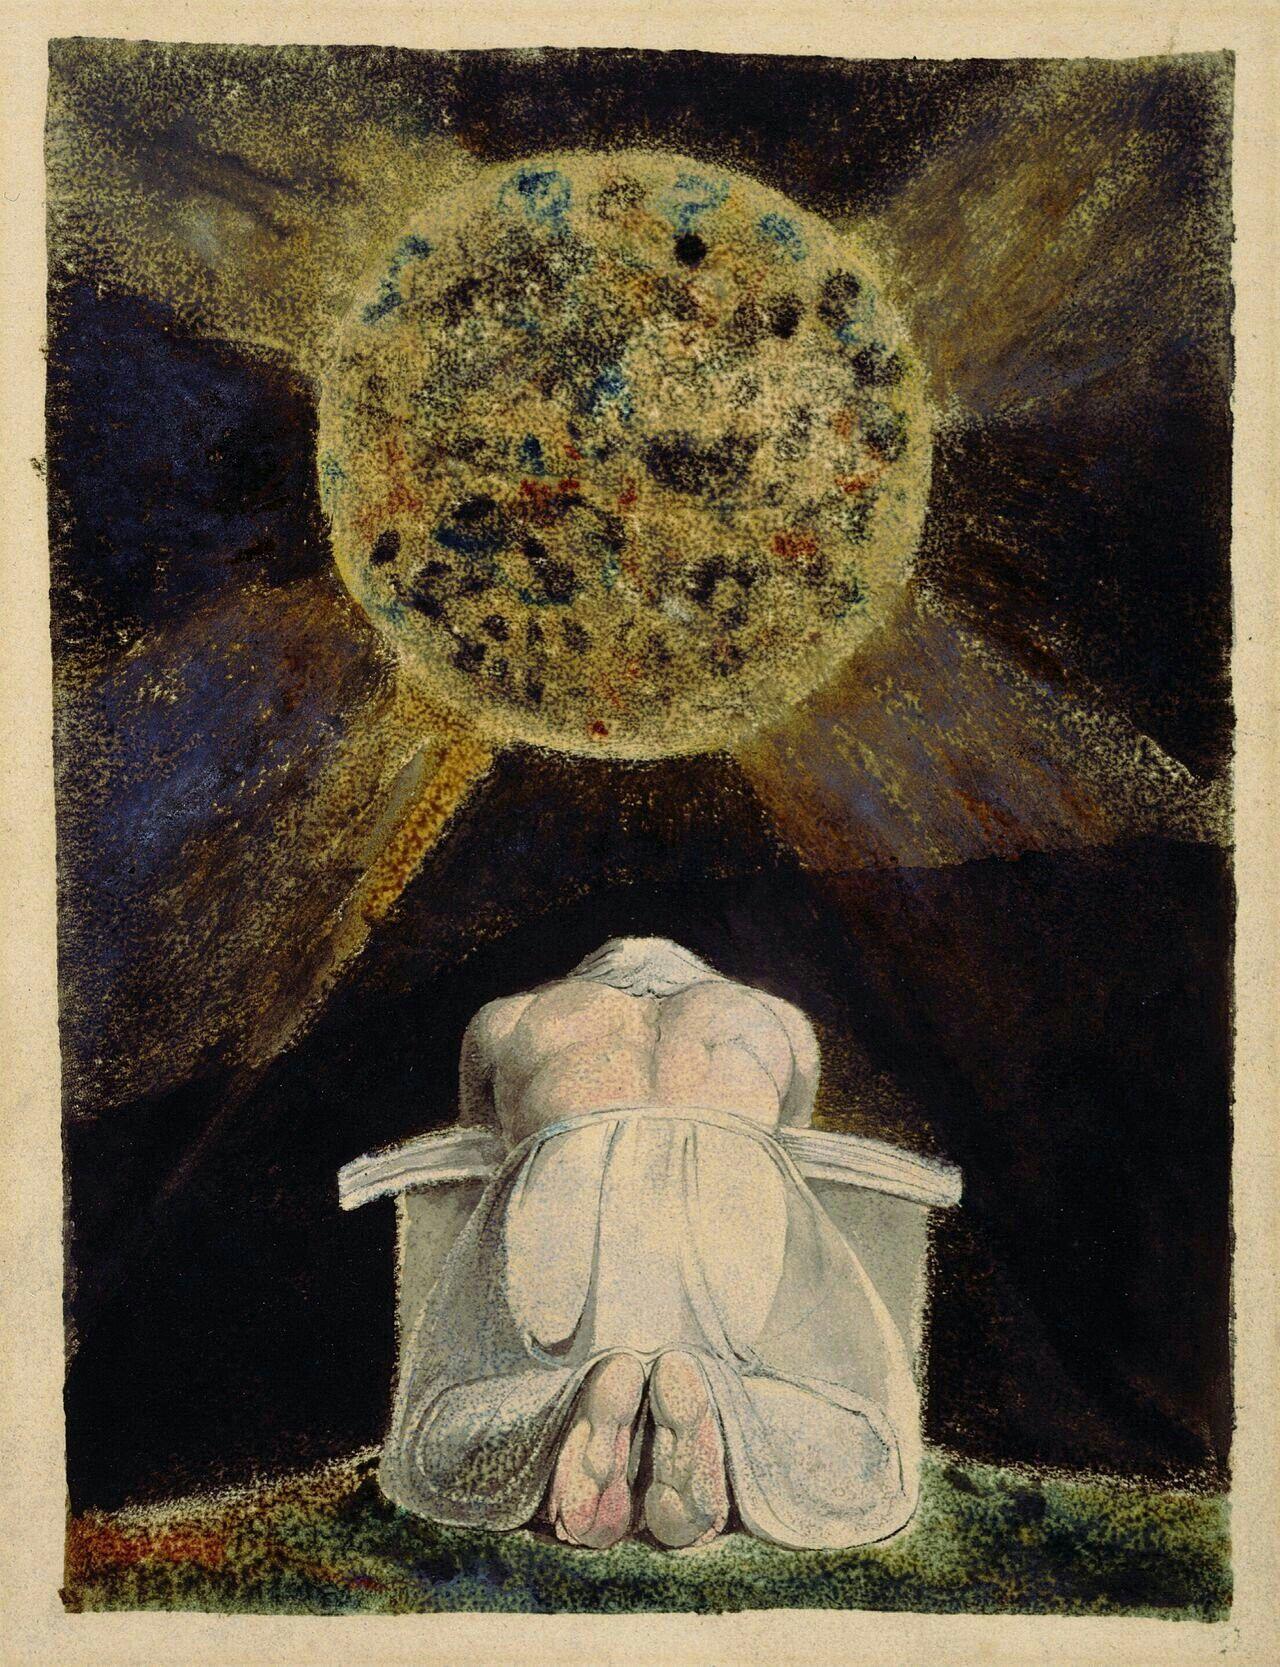 The song of Los. Lambeth, Printed by W. Blake, 1795.